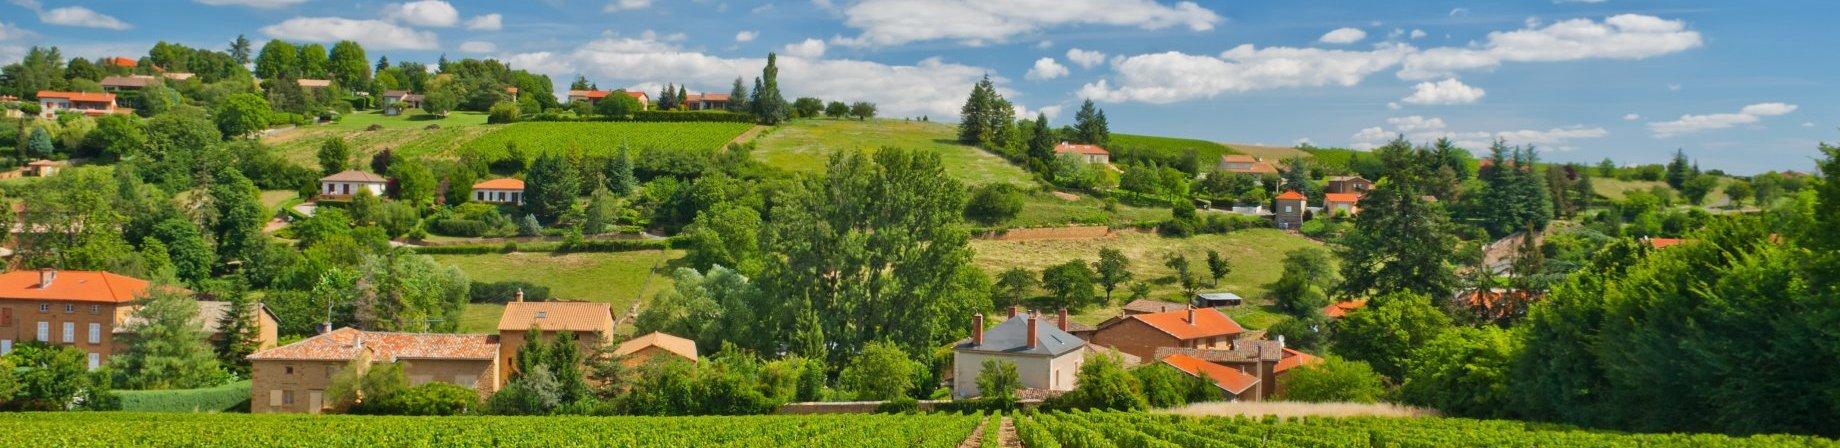 Ch teau de la chaize french winery aoc brouilly for Brouilly chateau de la chaise